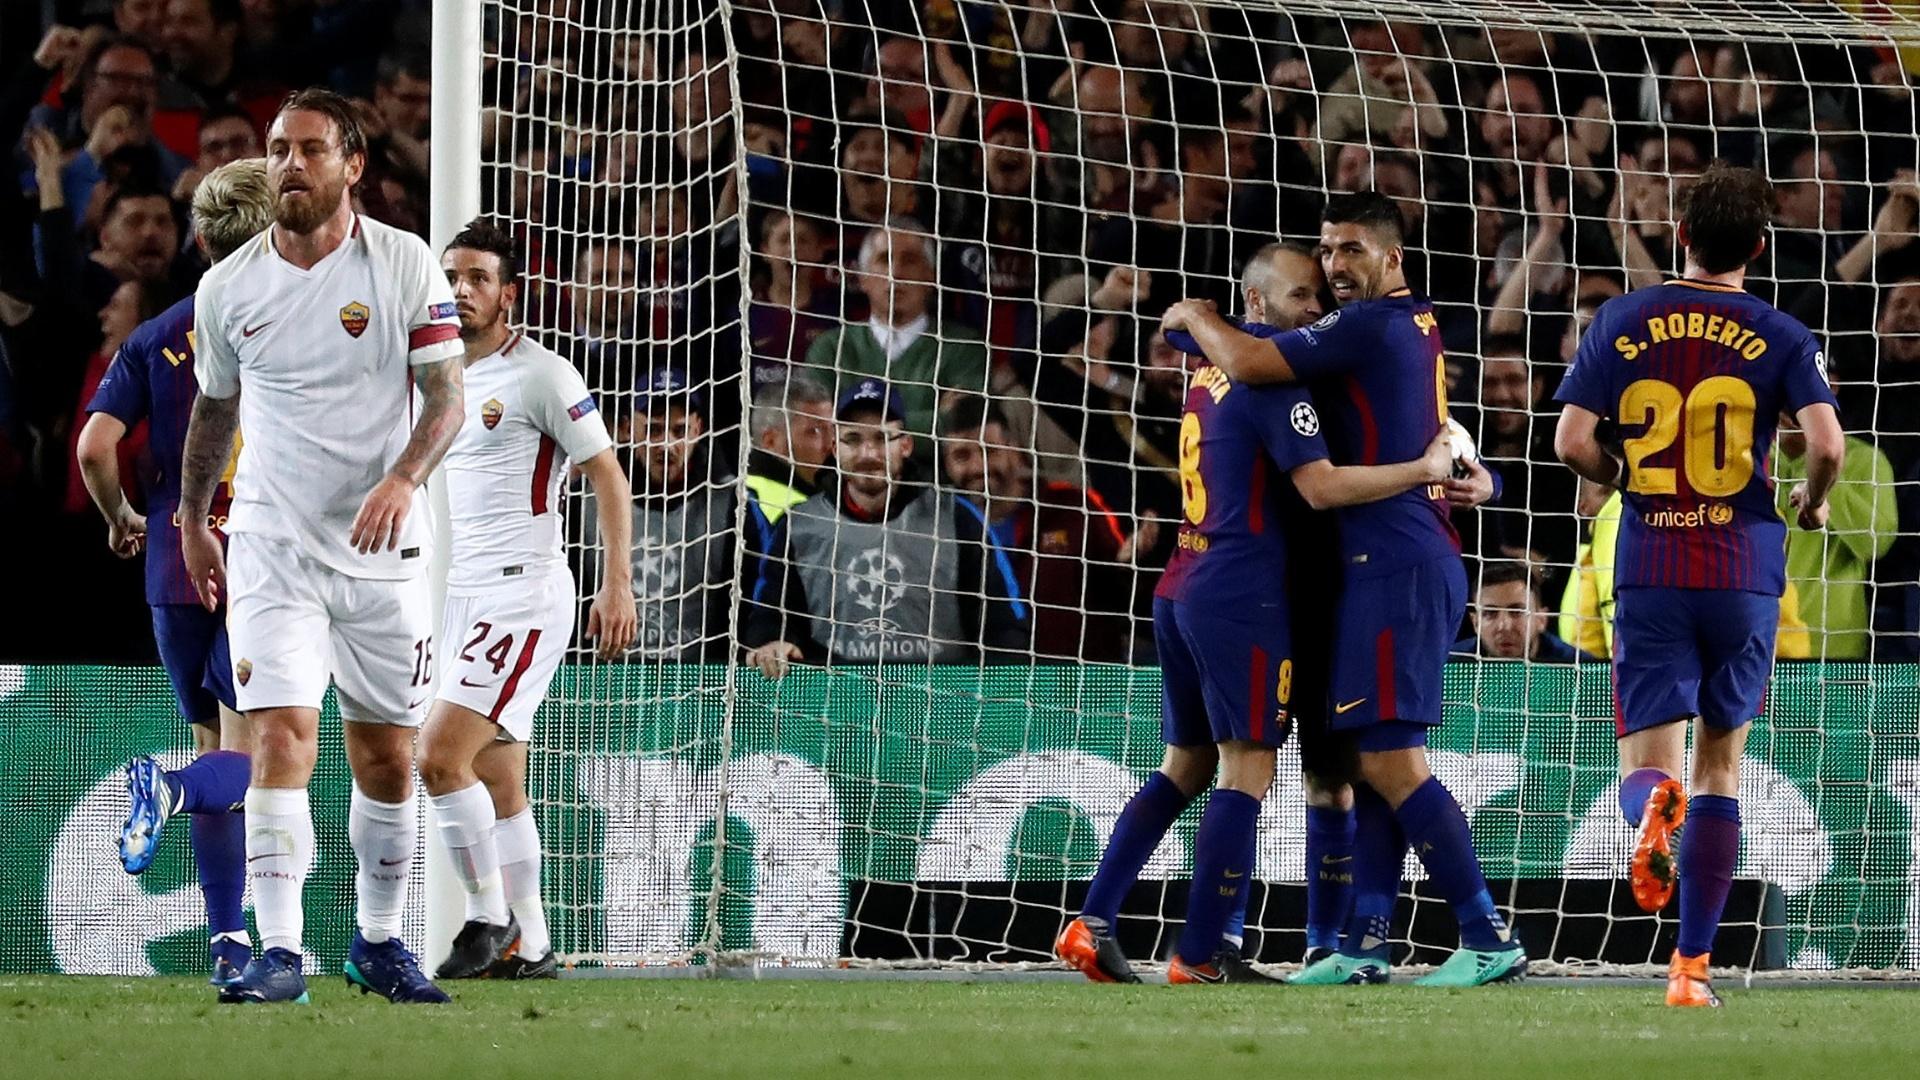 Jogadores do Barcelona comemoram gol marcado contra a Roma